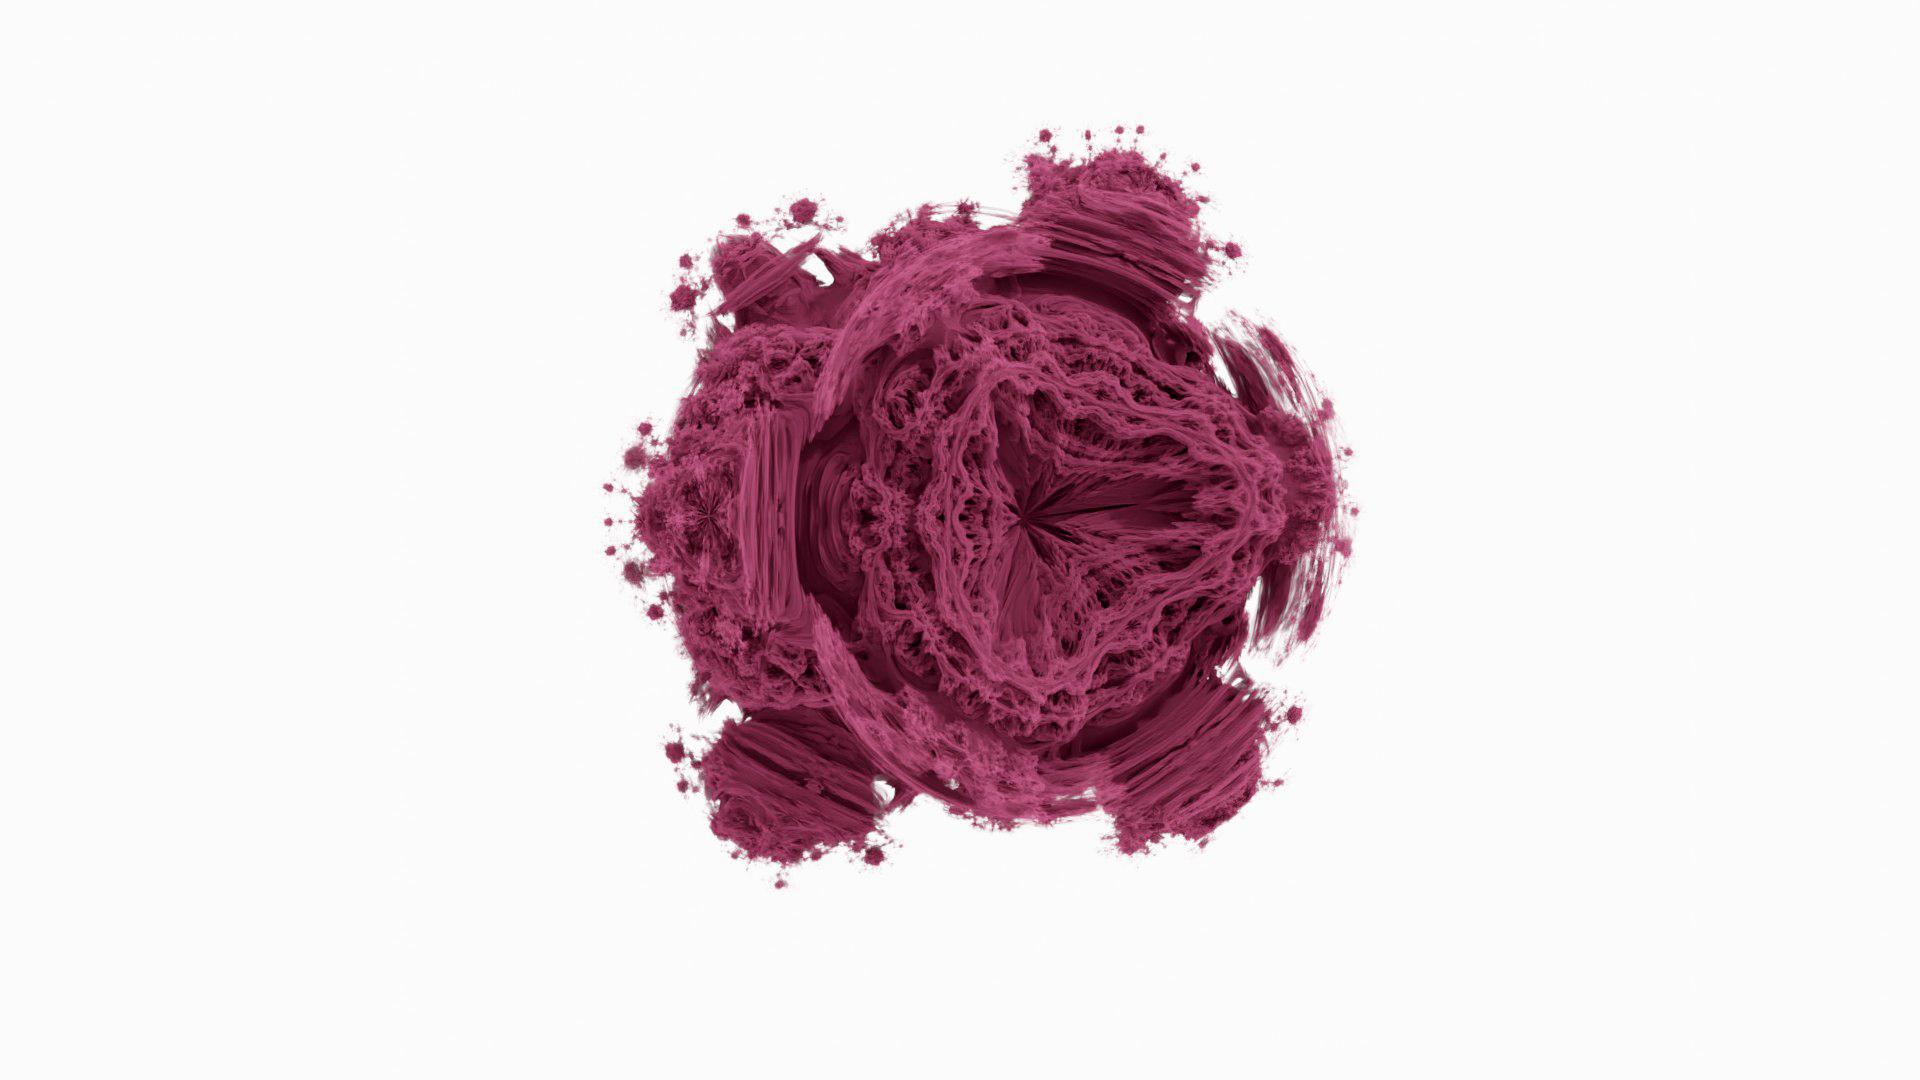 fractal III